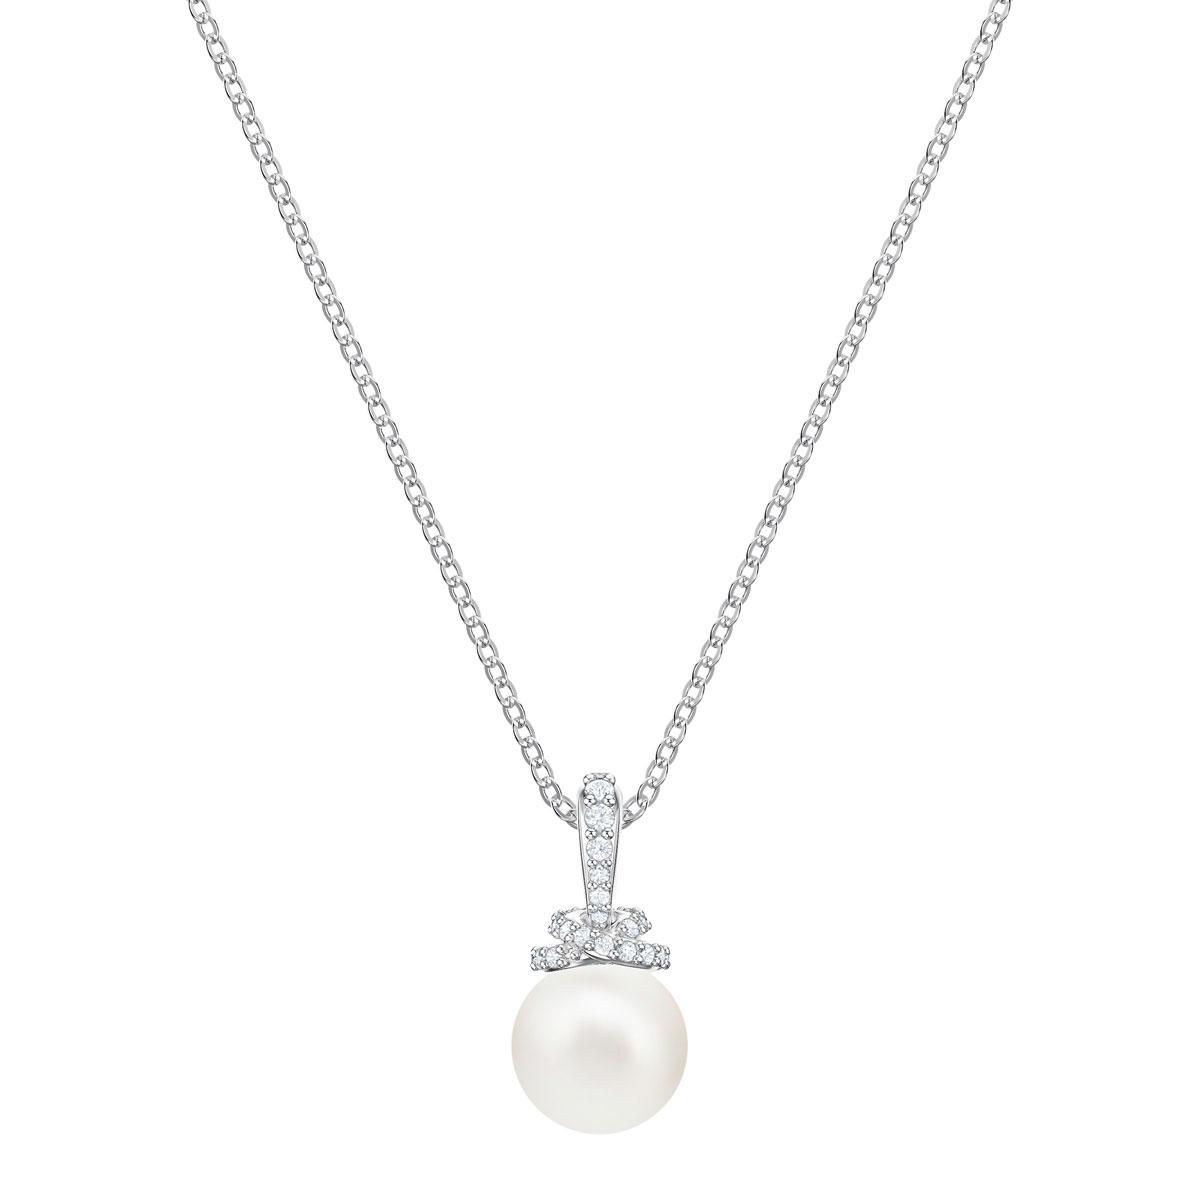 Swarovski Pearl and Rhodium Originally Pendant Necklace